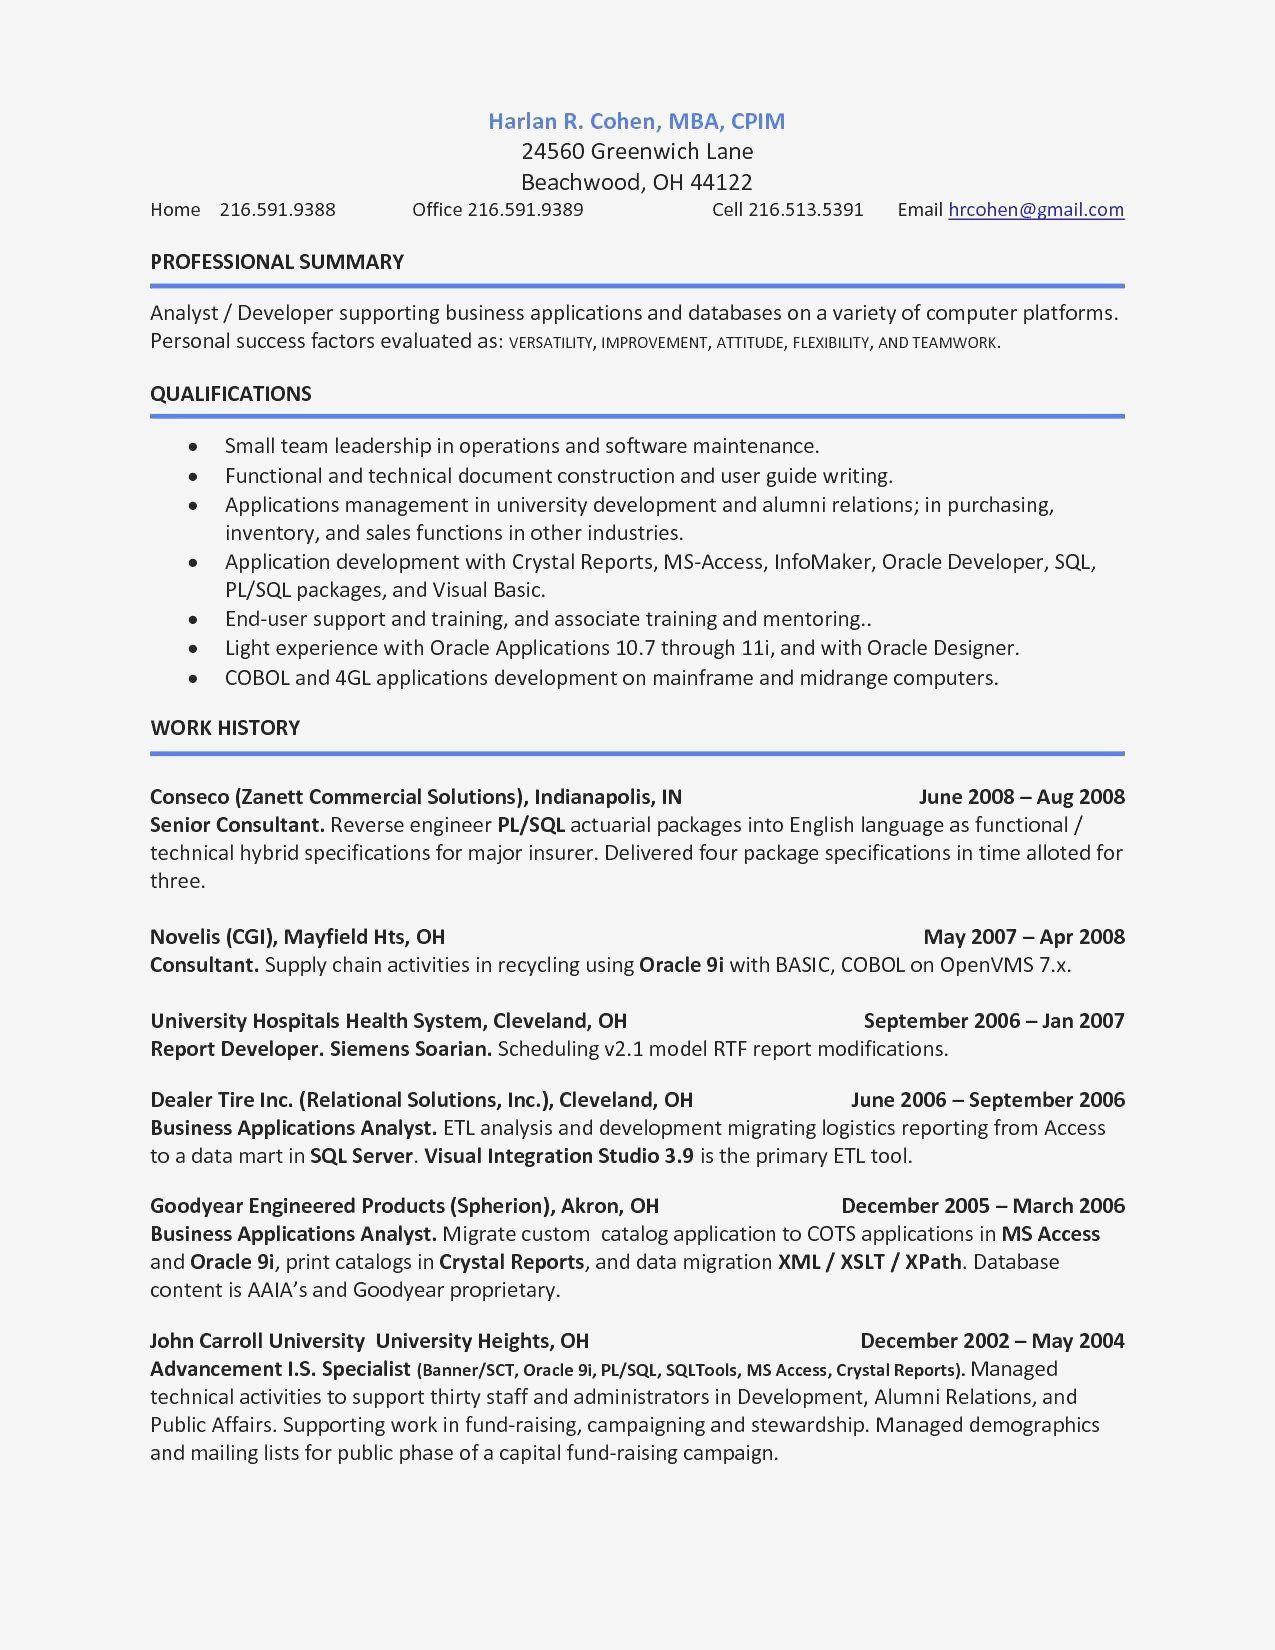 Business Development Resume Sample Best Of Accounting Assistant Resume Sample Examples Resume Sample Job Resume Examples Resume Skills Resume Examples